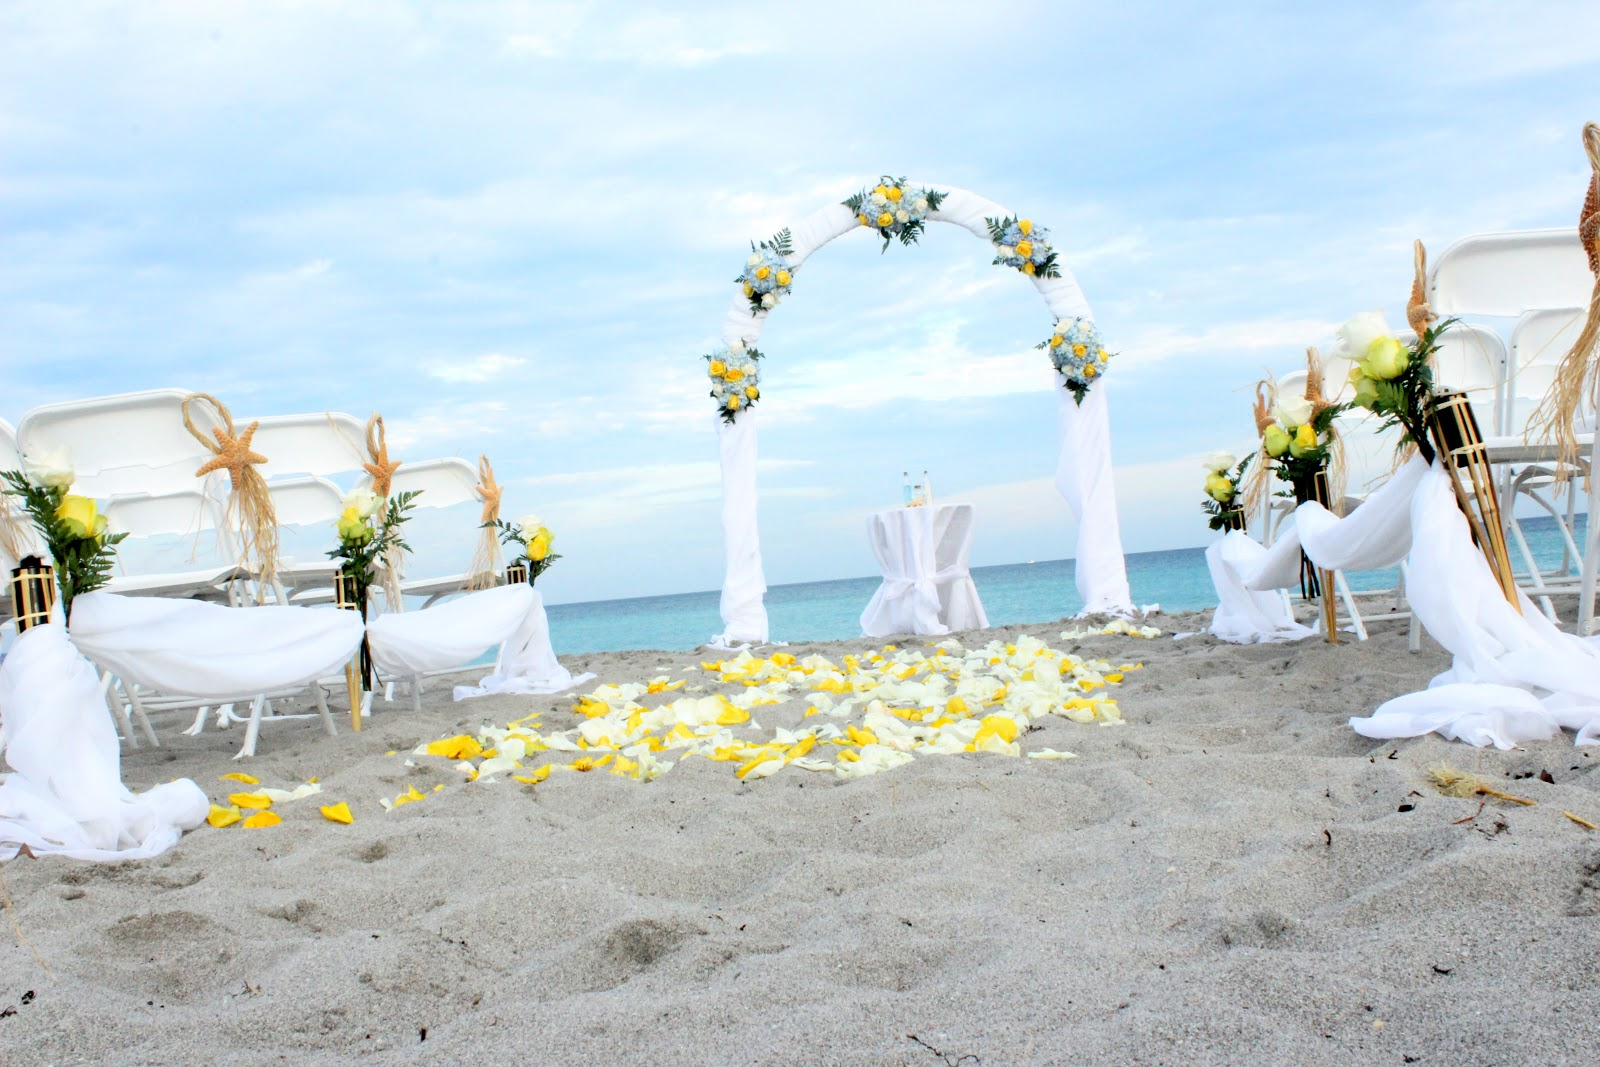 Affordable Beach Weddings! 305-793-4387: Jeanie & Patrick